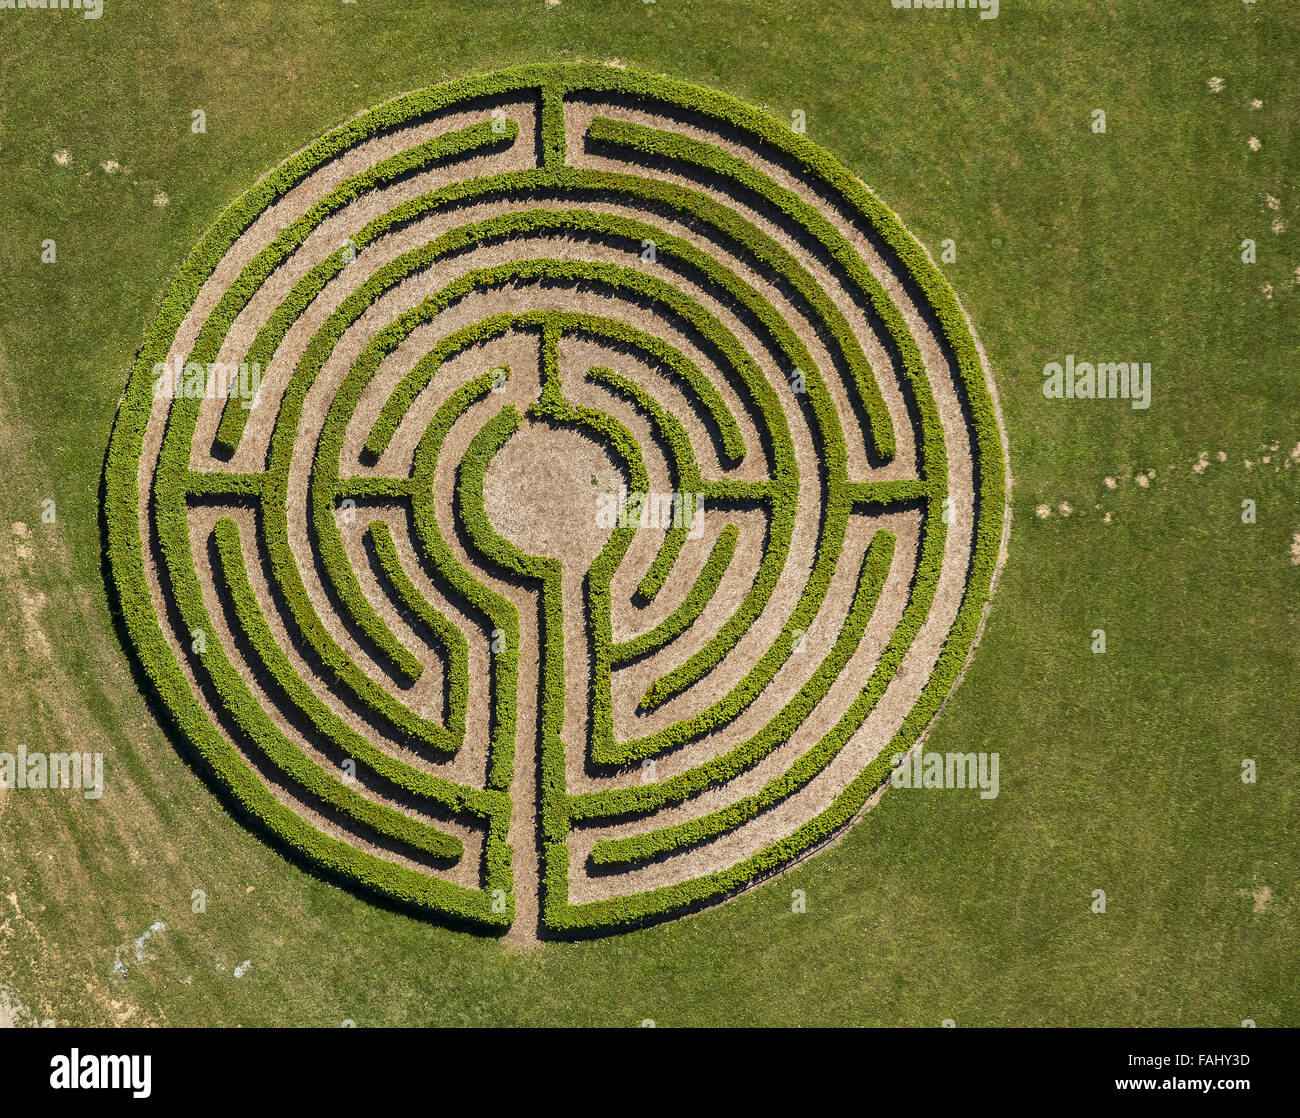 Luftbild Labyrinth Absicherung Irrgarten Labyrinth